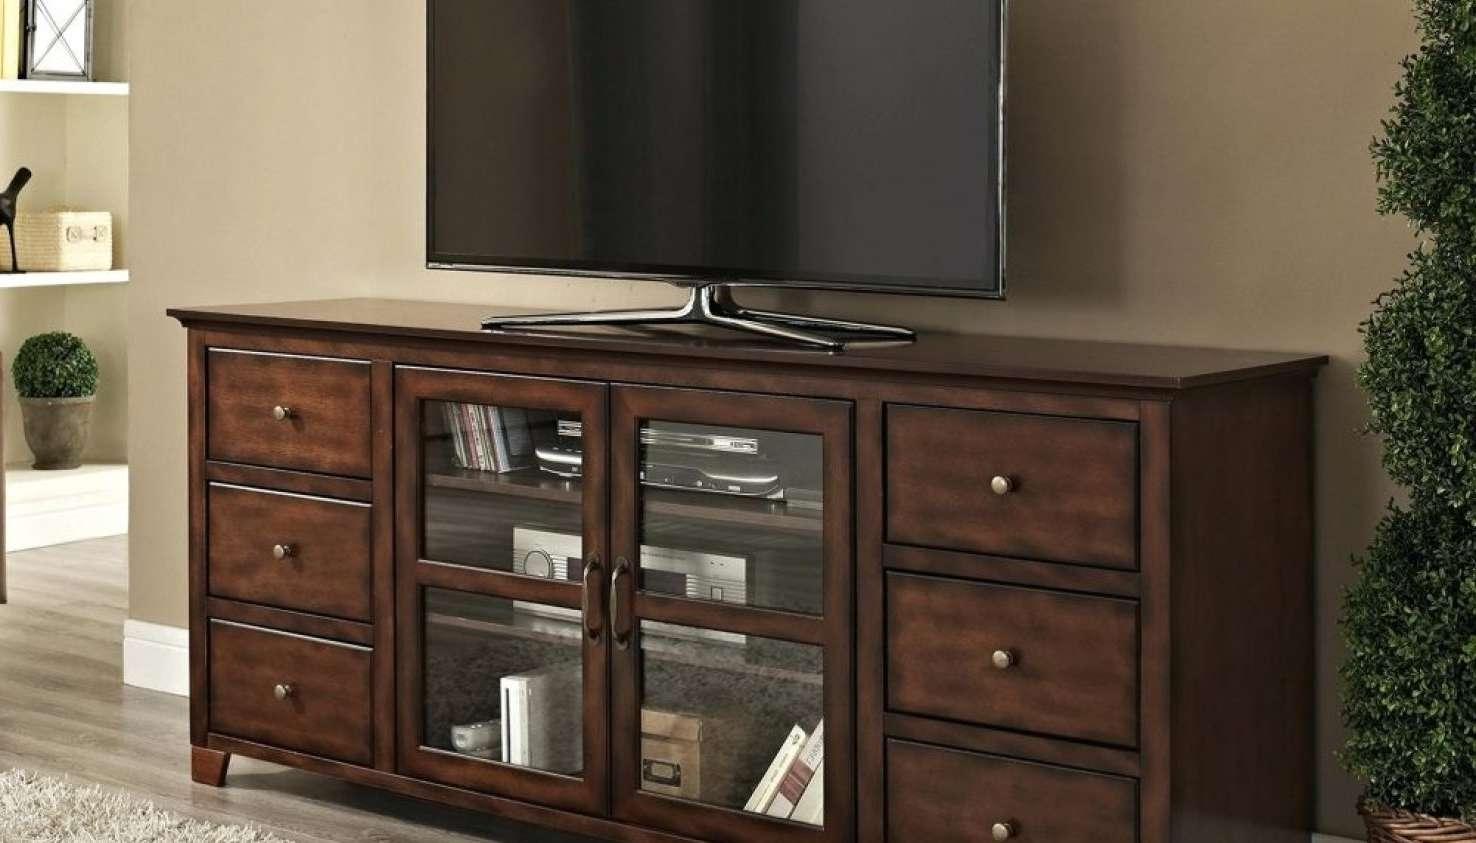 Tv : Stunning Bedroom Tv Stand Design Stunning Tall Tv Stands For Regarding Tall Tv Stands For Flat Screen (View 13 of 15)